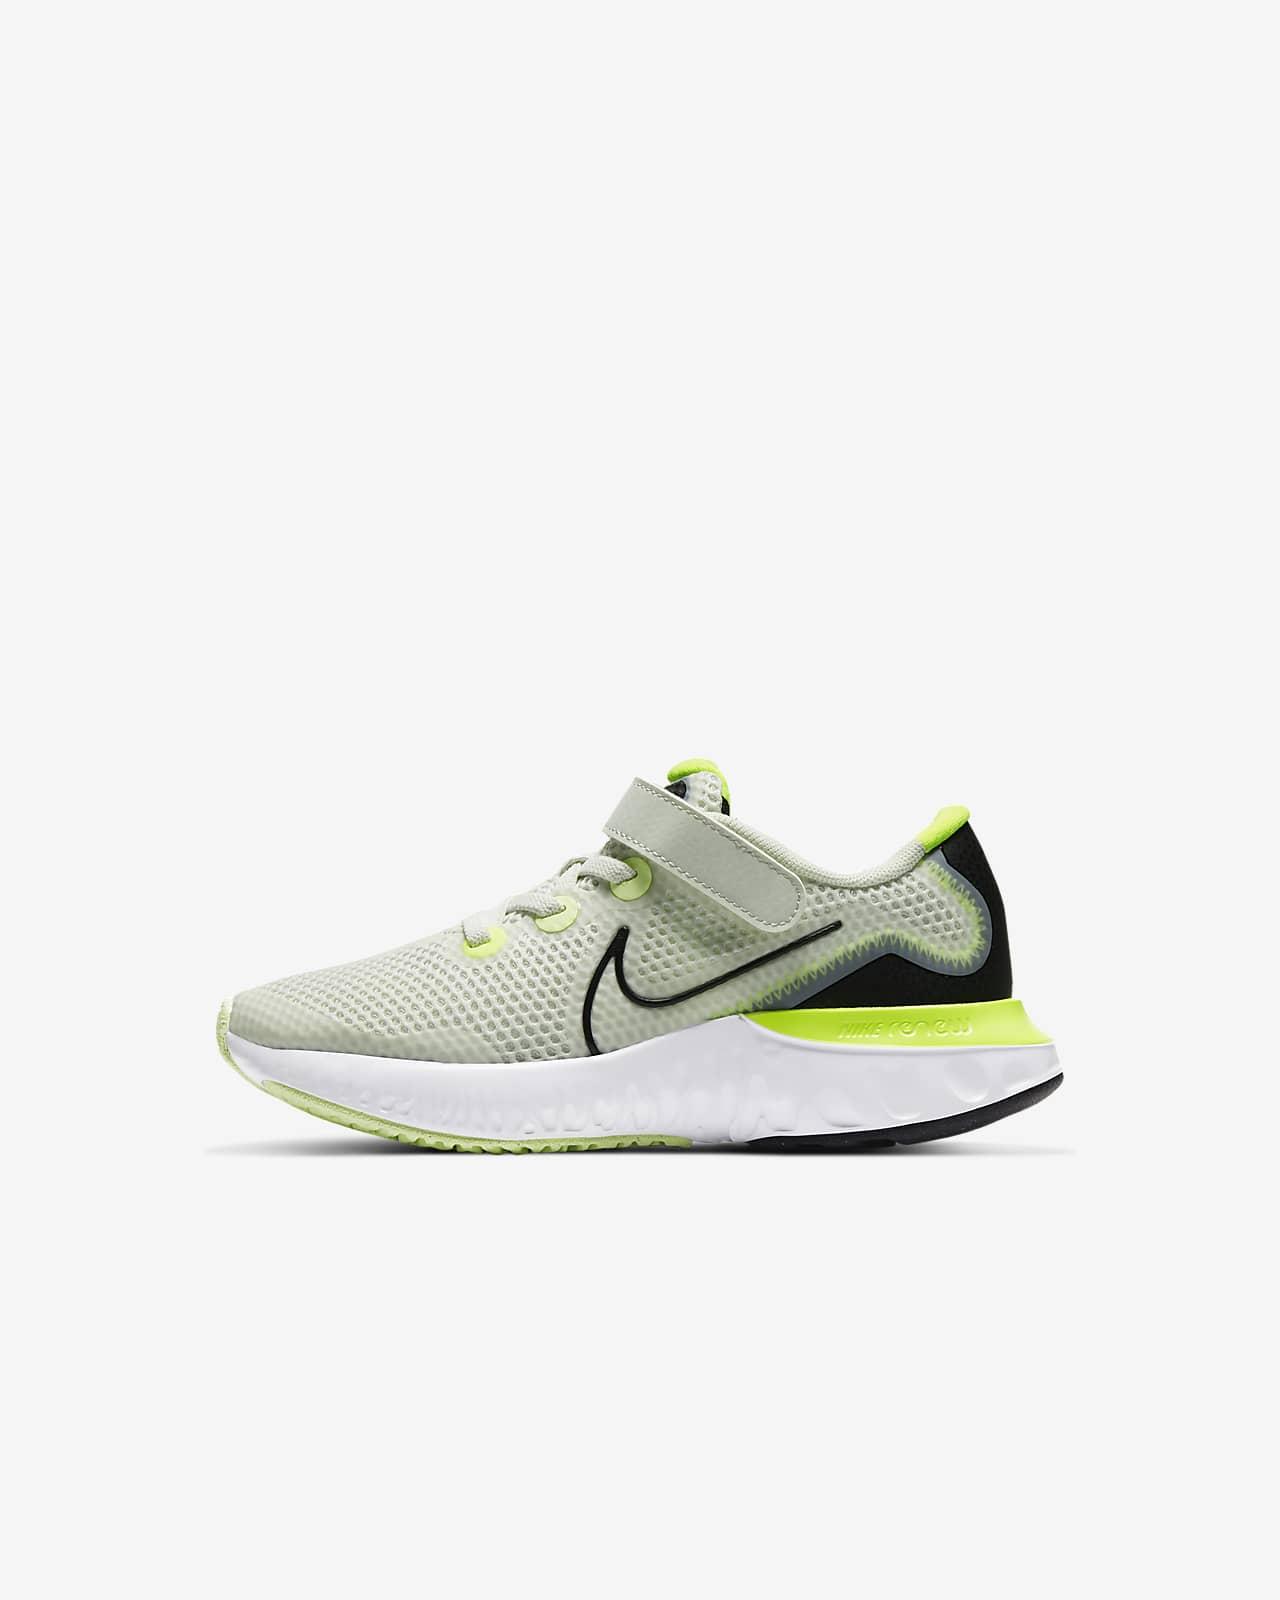 Chaussure Nike Renew Run pour Jeune enfant. Nike LU